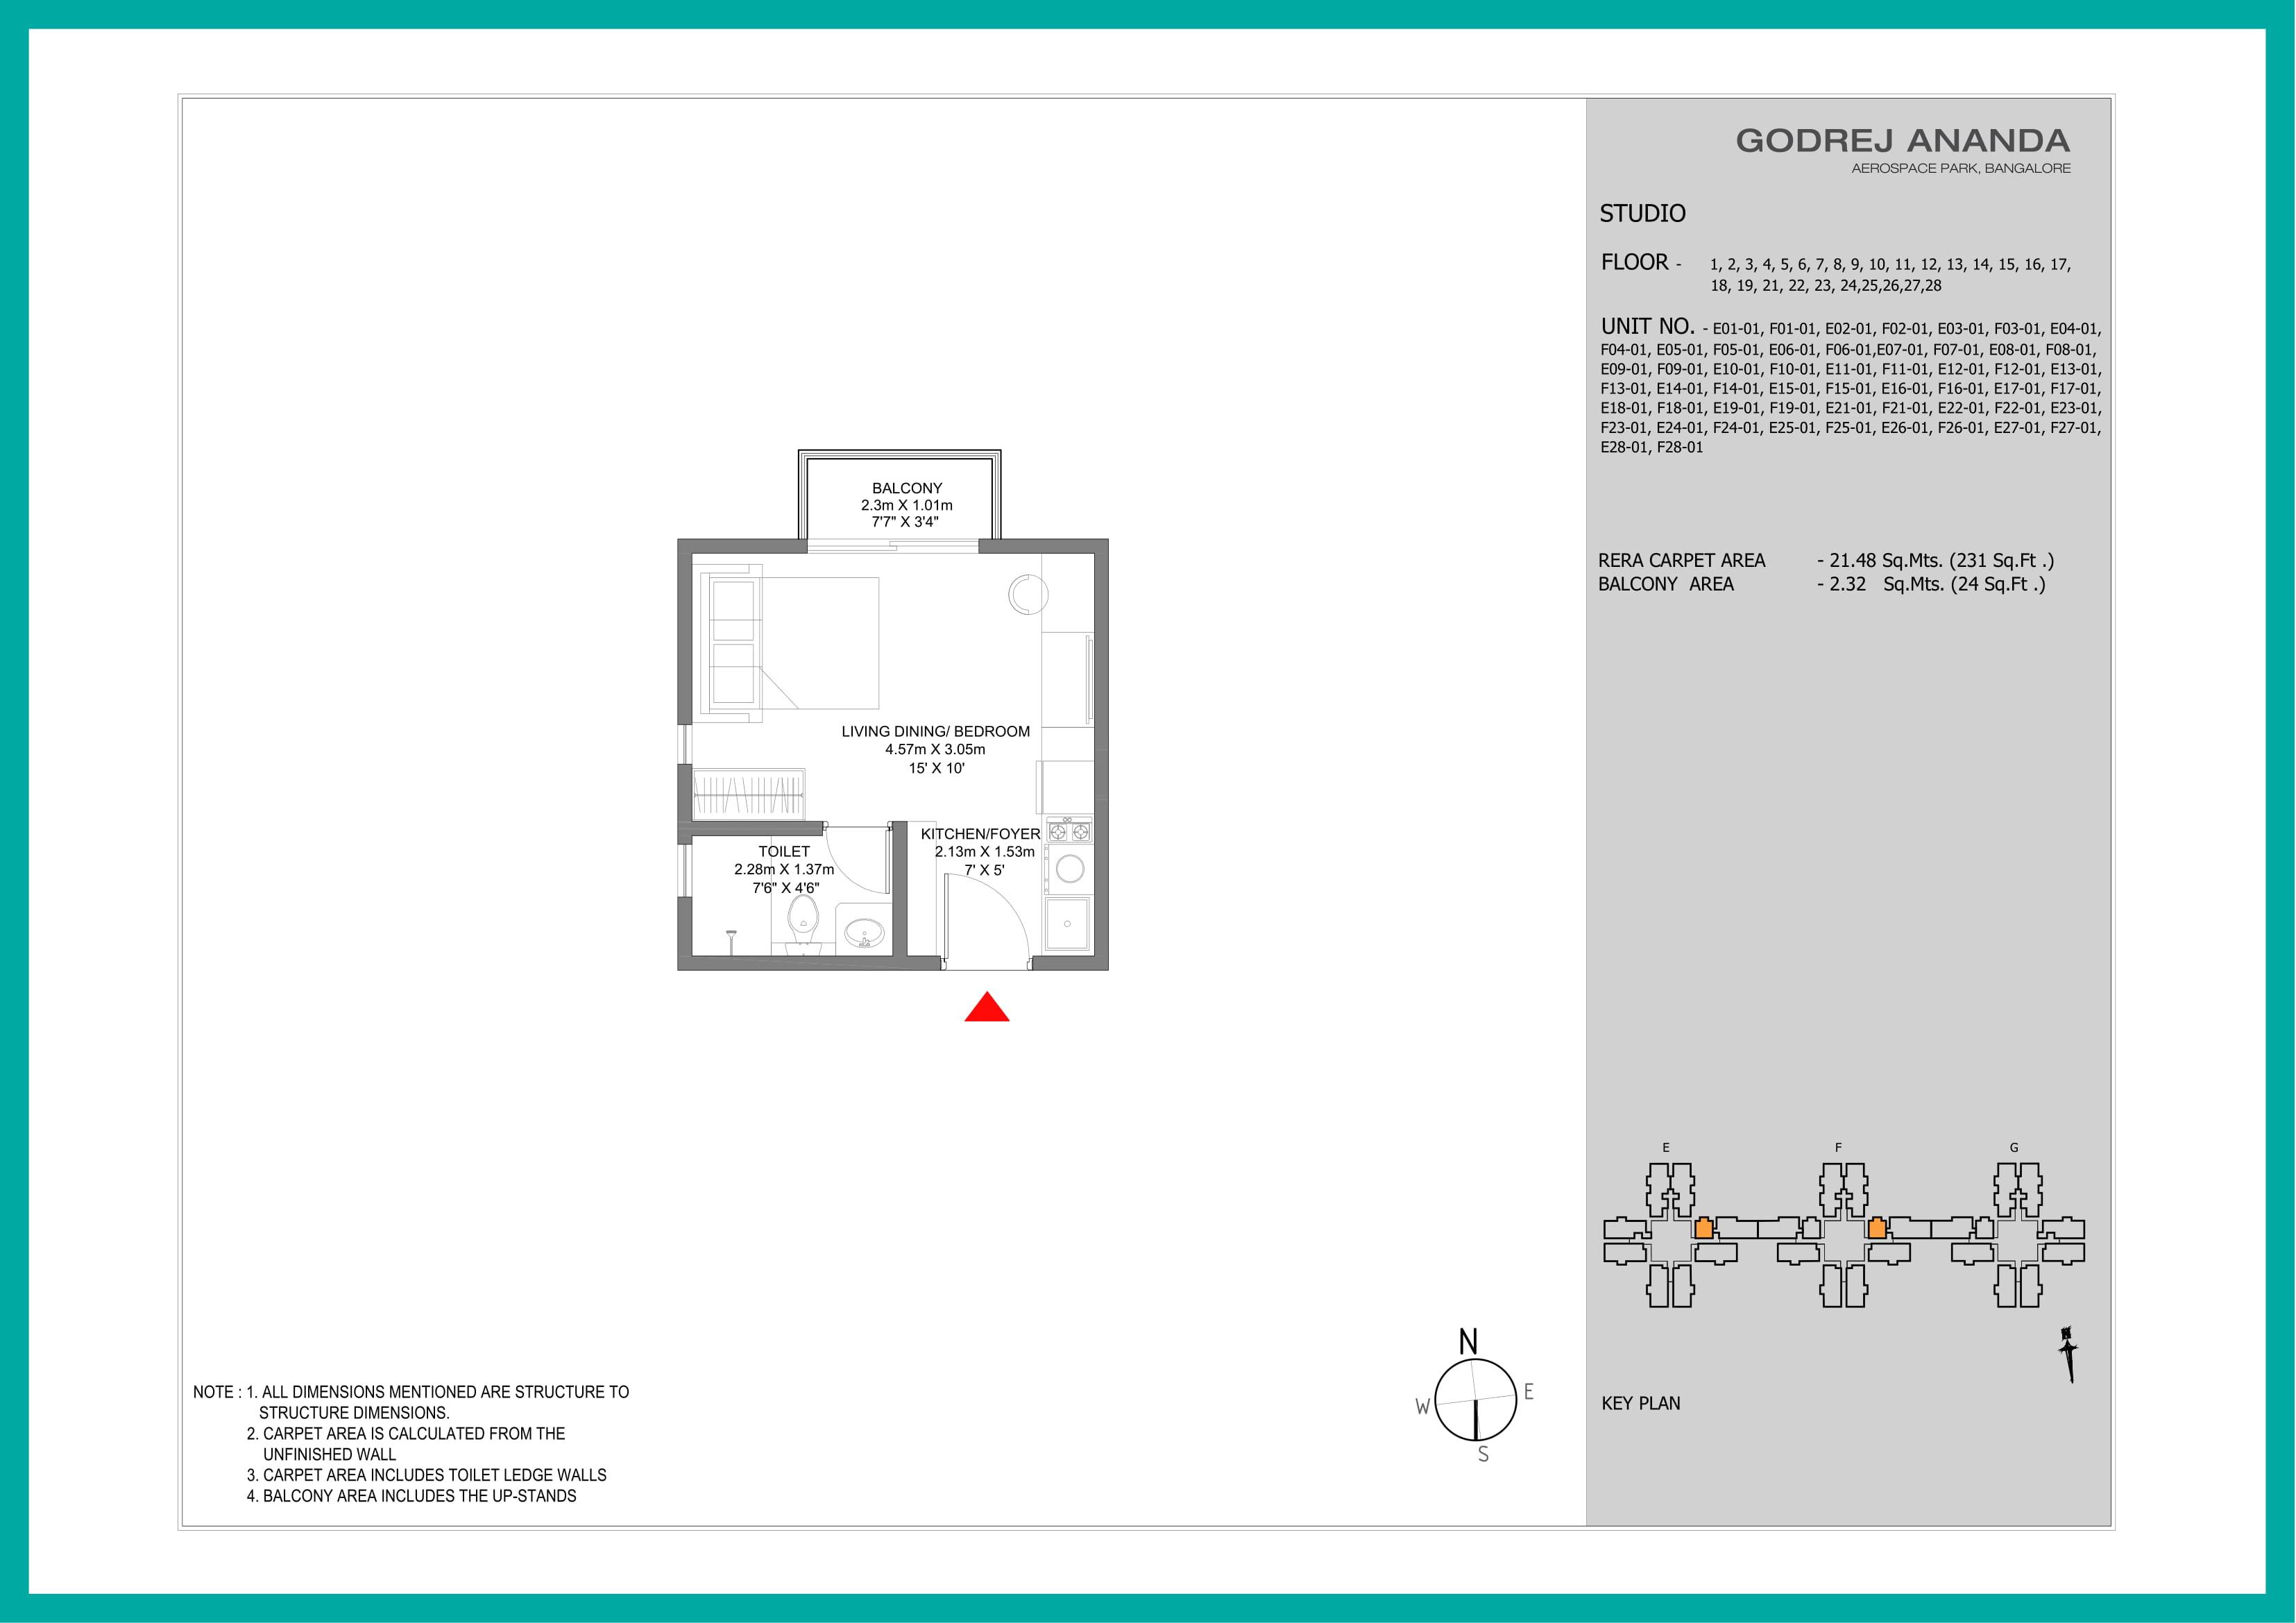 Godrej Ananda Floor Plan 1 BHK